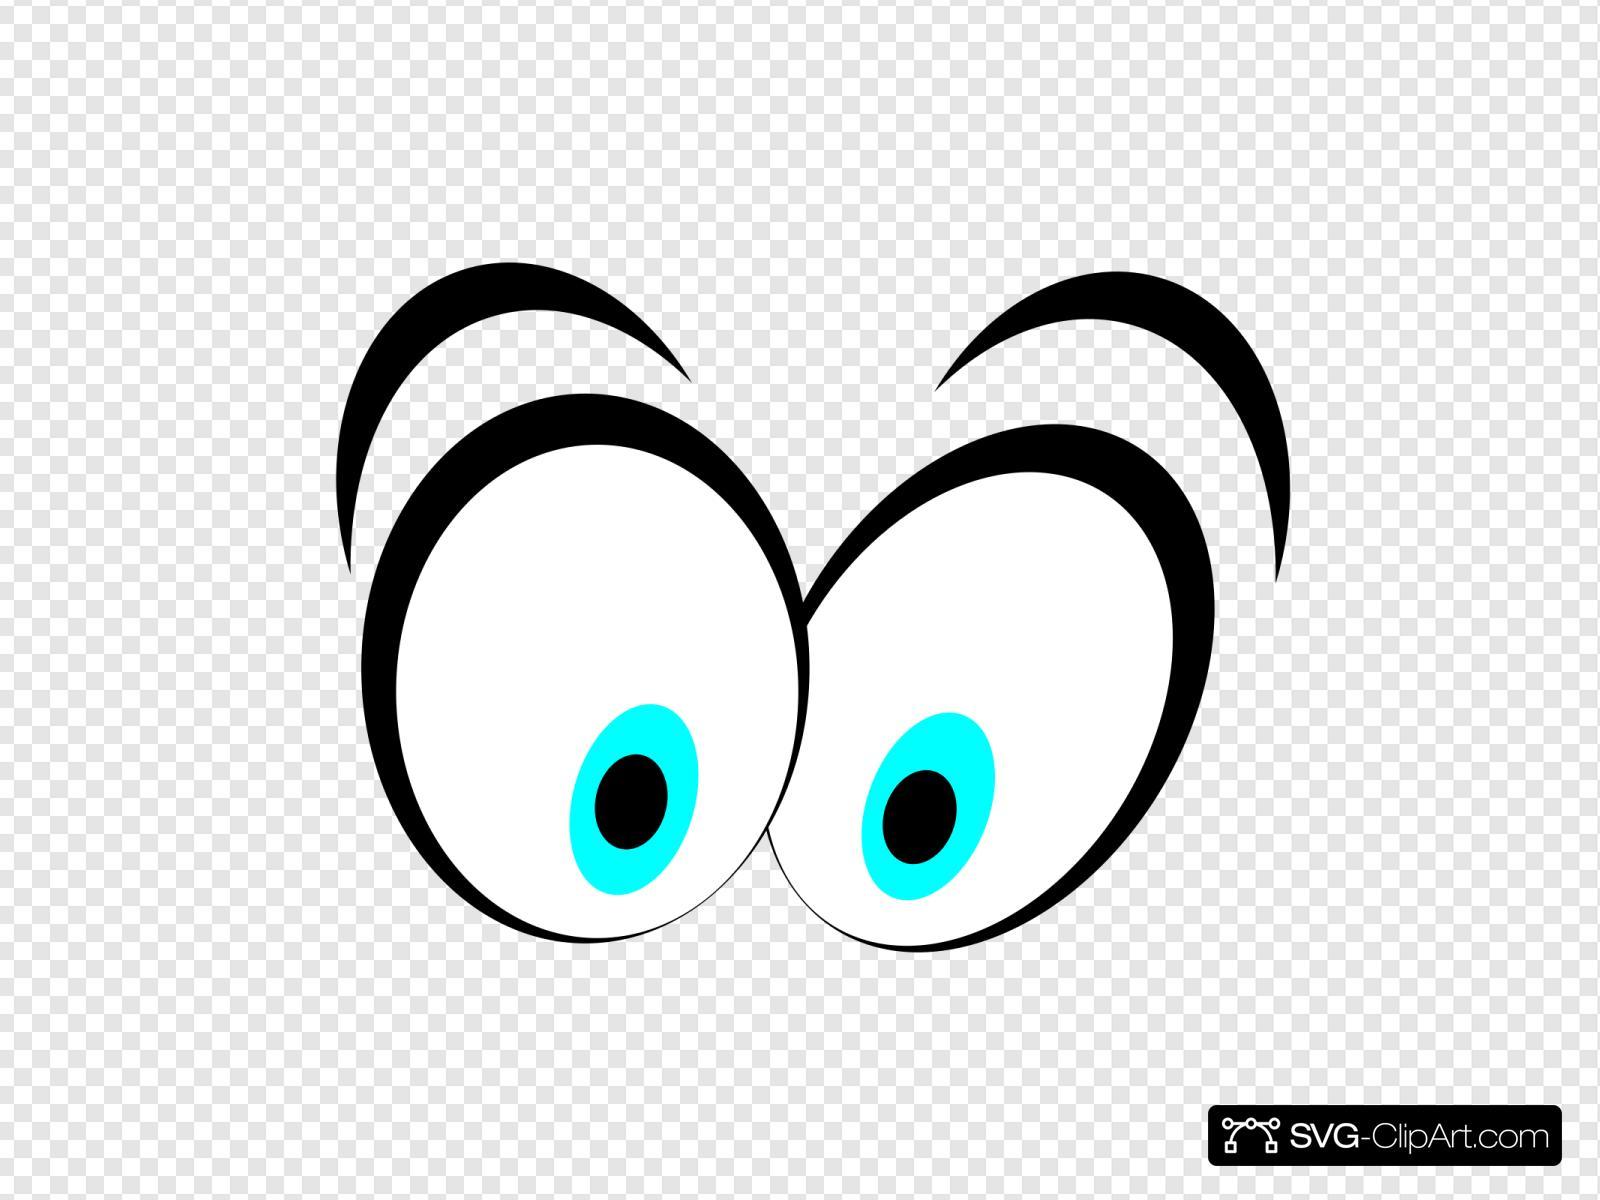 Animated Blue Cartoon Eyes Svg Vector Animated Blue Cartoon Eyes Clip Art Svg Clipart